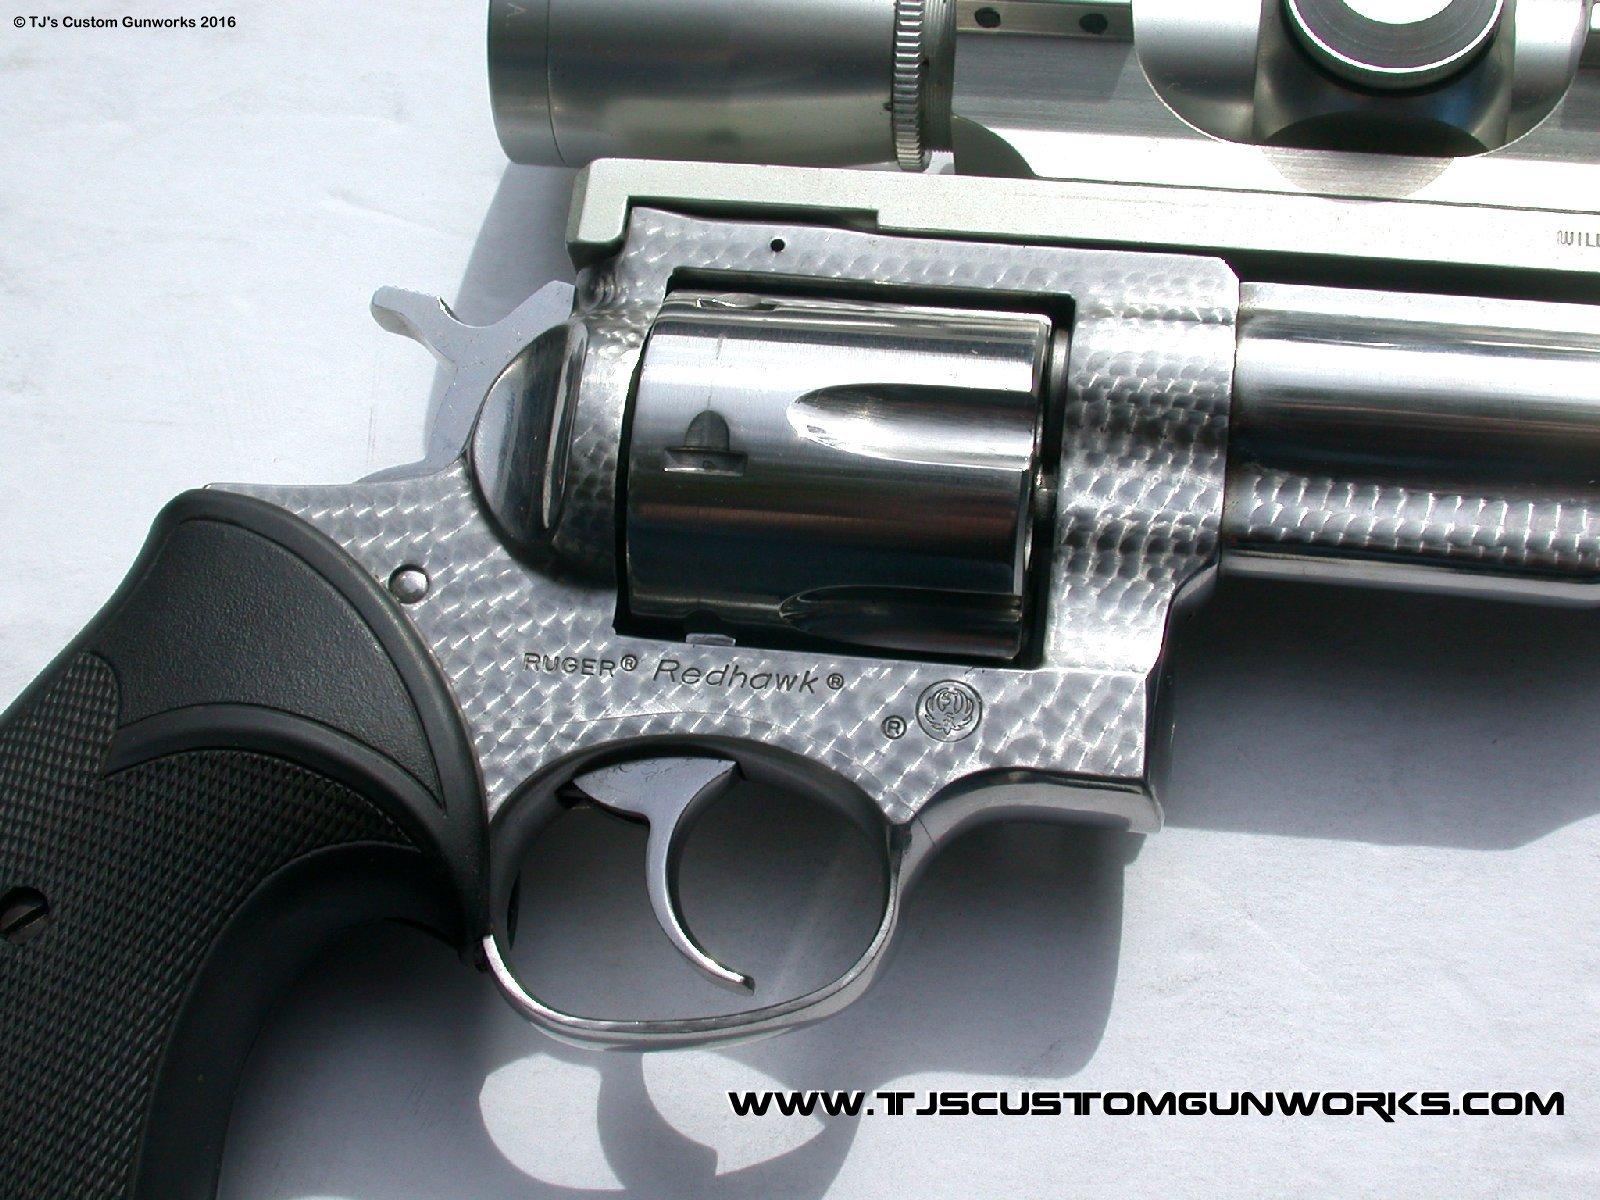 Extreme Custom Jewelled Ruger Redhawk 44 Magnum